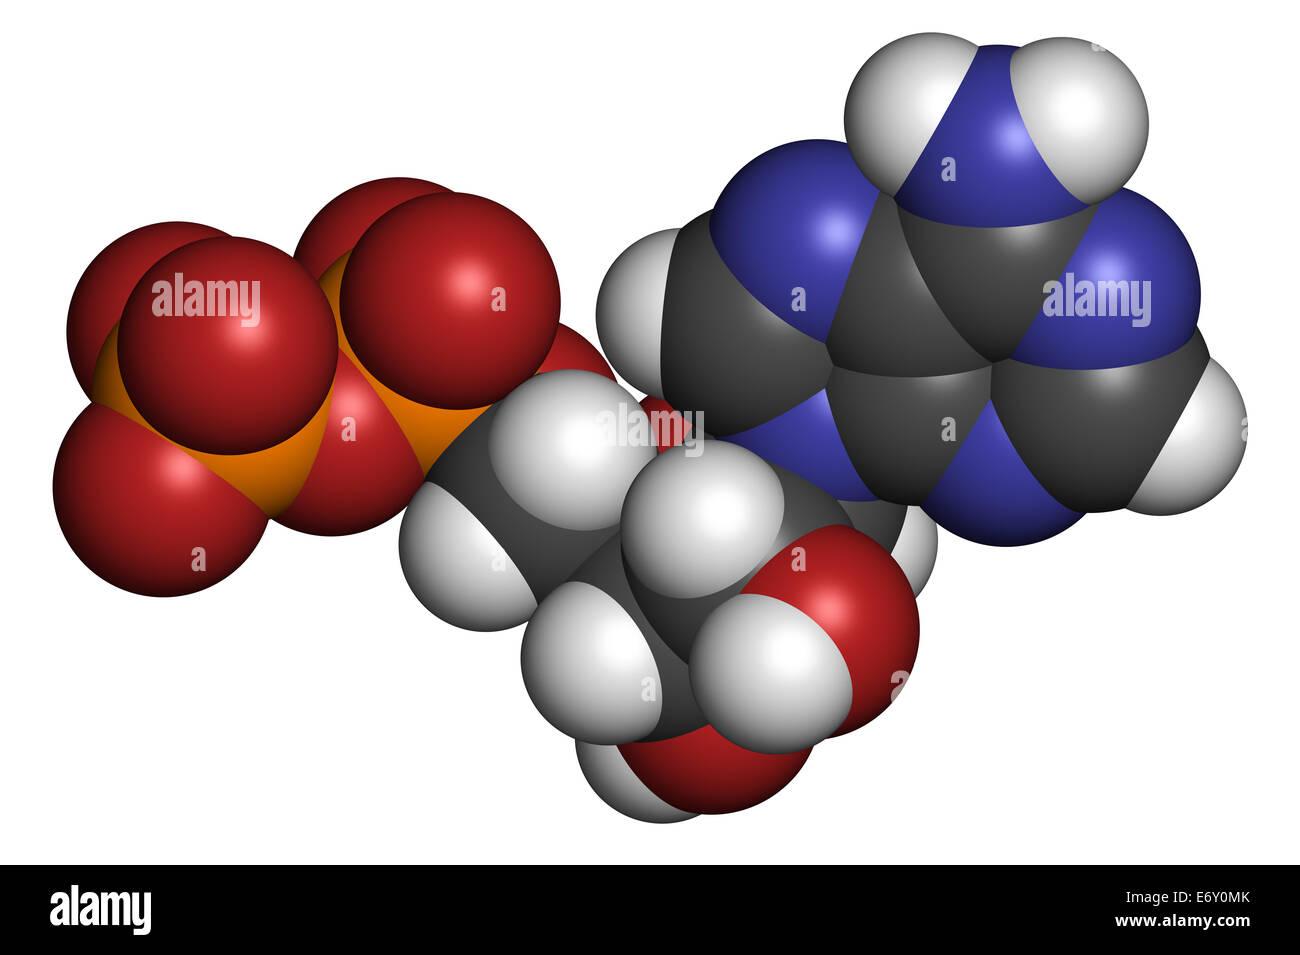 adp molecule diagram labeled 99 ford ranger xlt radio wiring adenosine triphosphate atp stock photos and